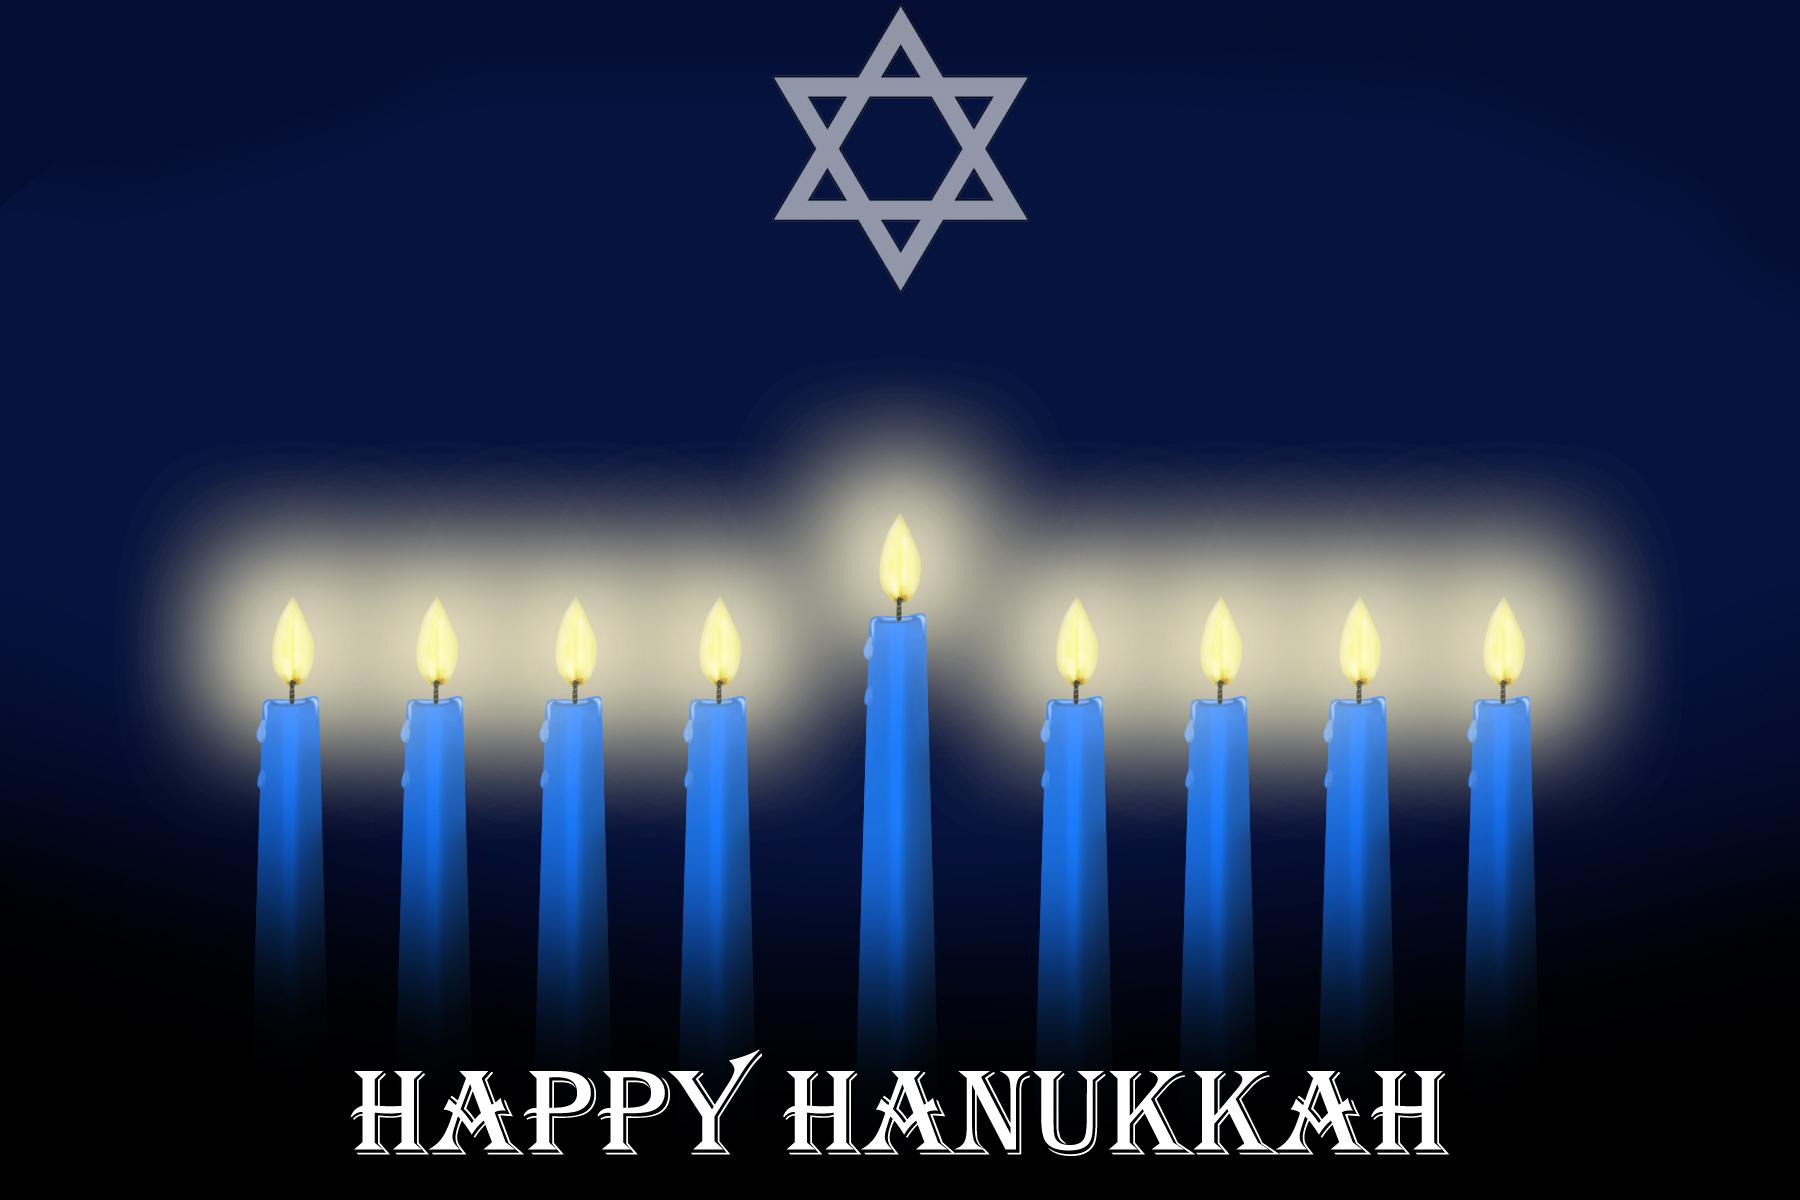 happy hanukkah authorstream - photo #17